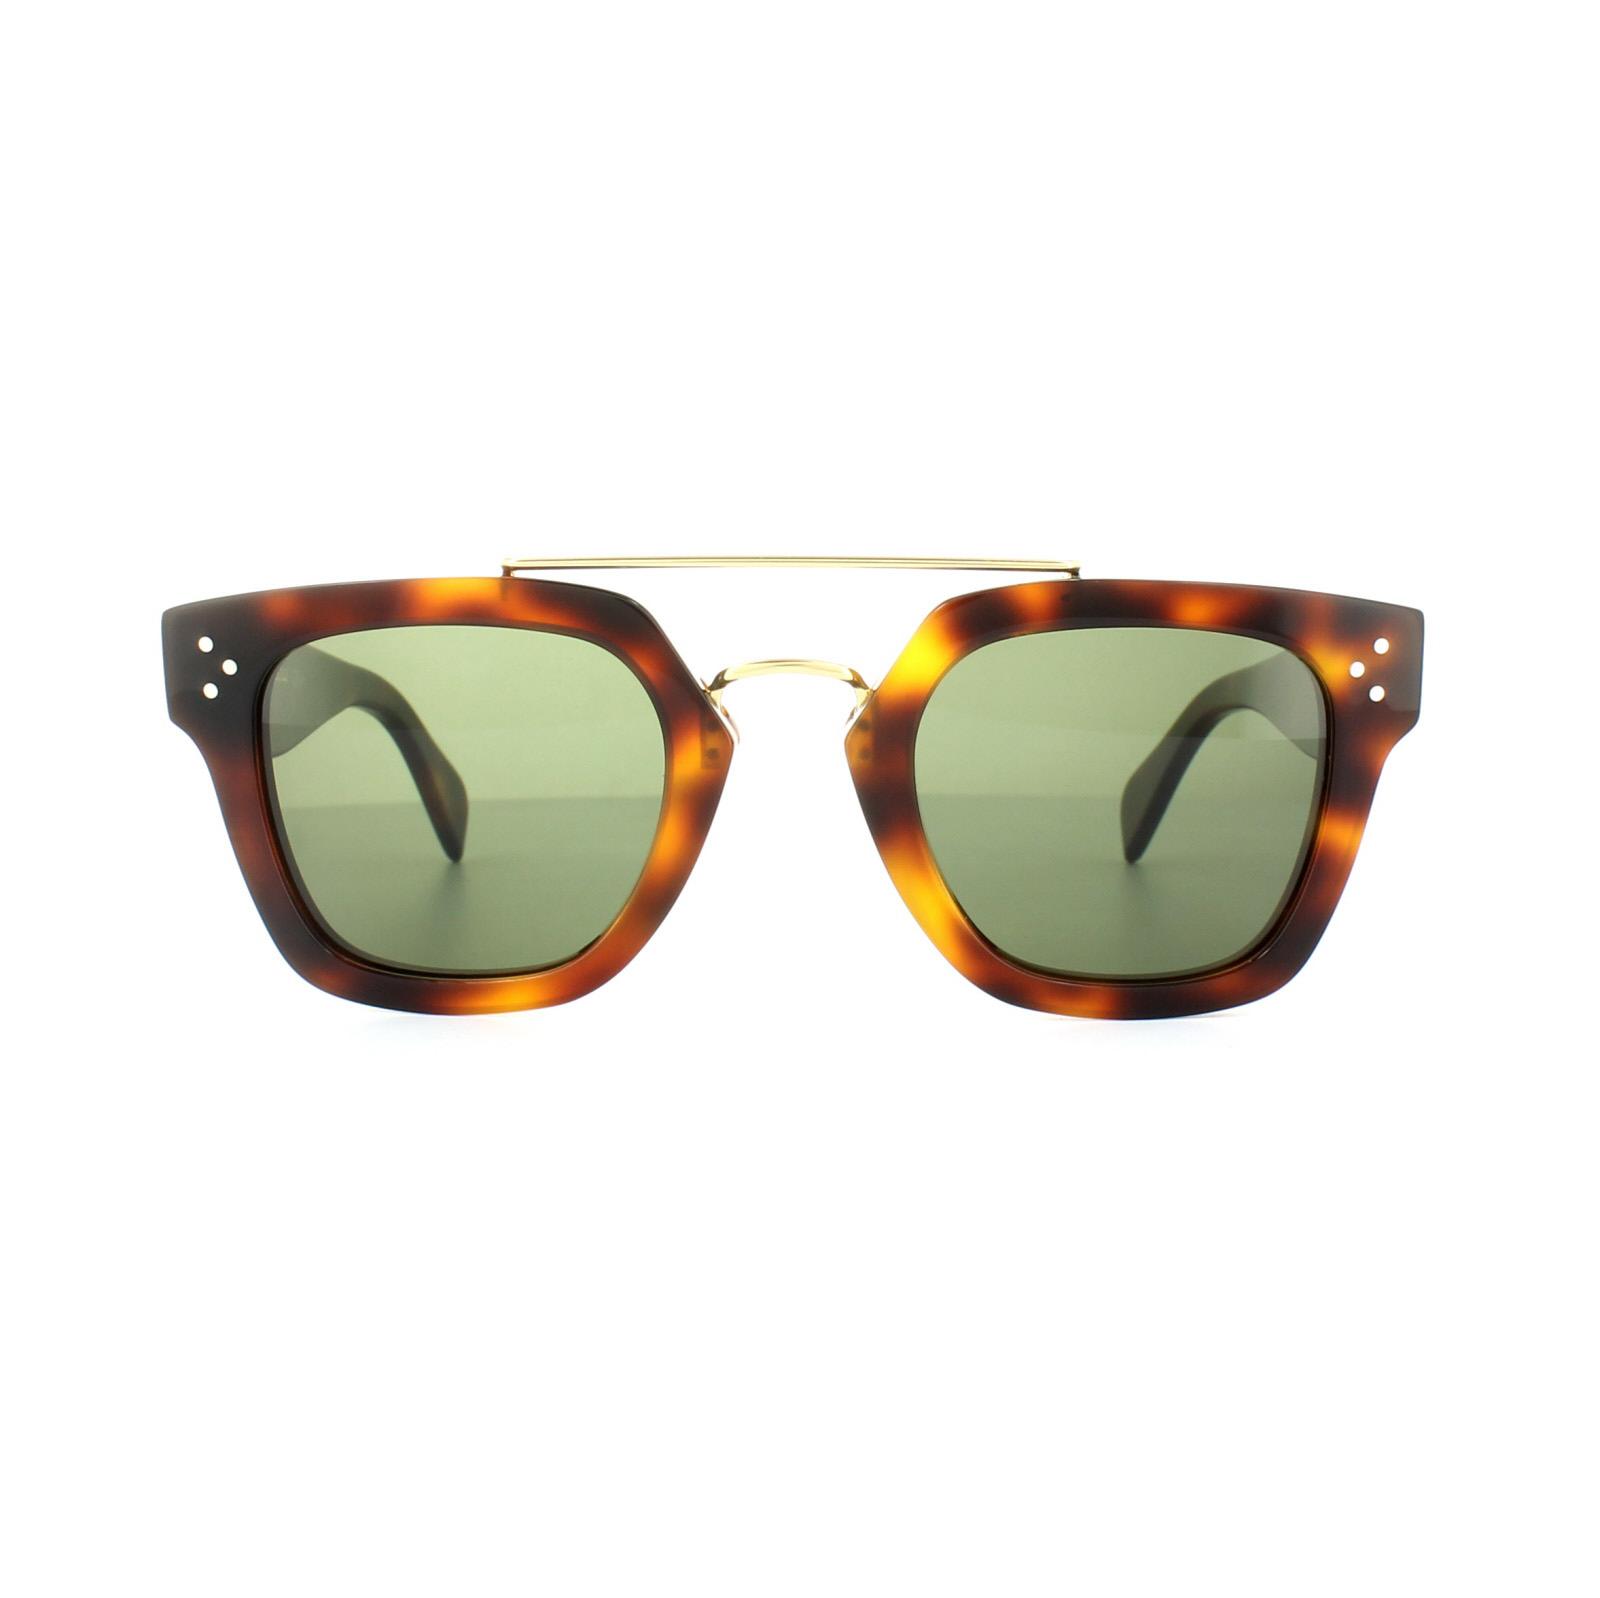 b8a787086d7 Cheap Celine 41077 S Bridge Sunglasses - Discounted Sunglasses